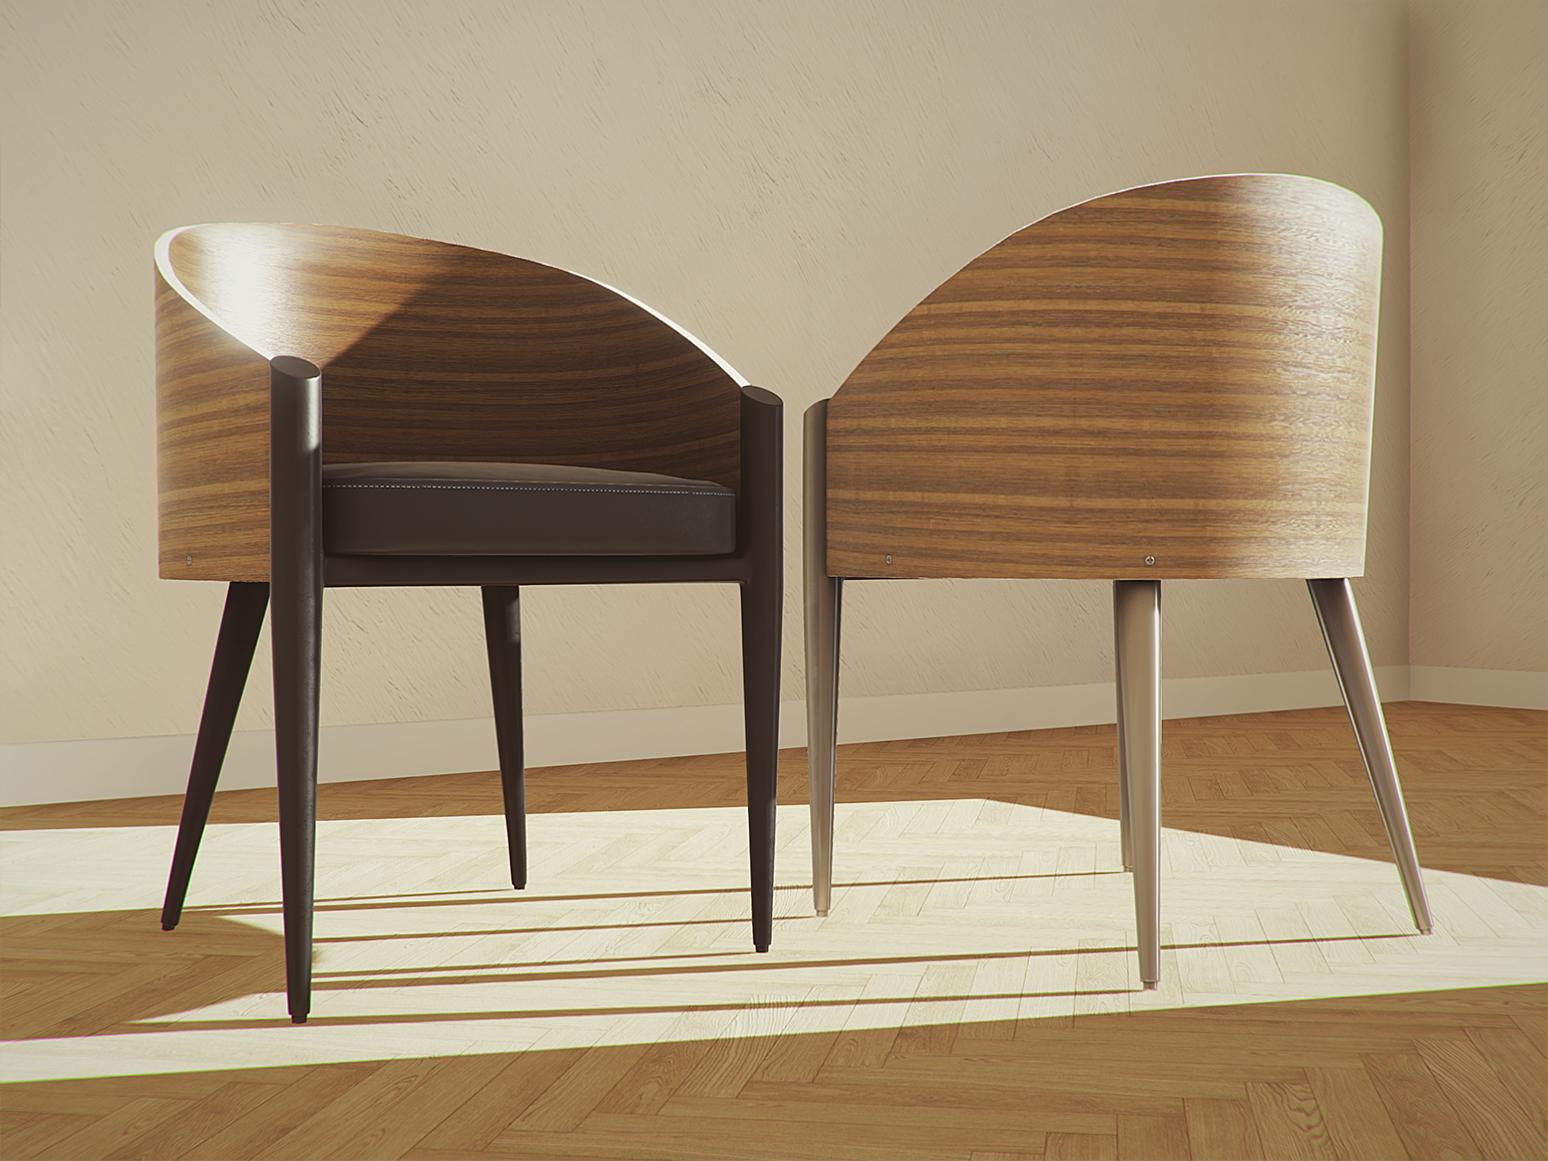 Enlight Furniture - Chair 01